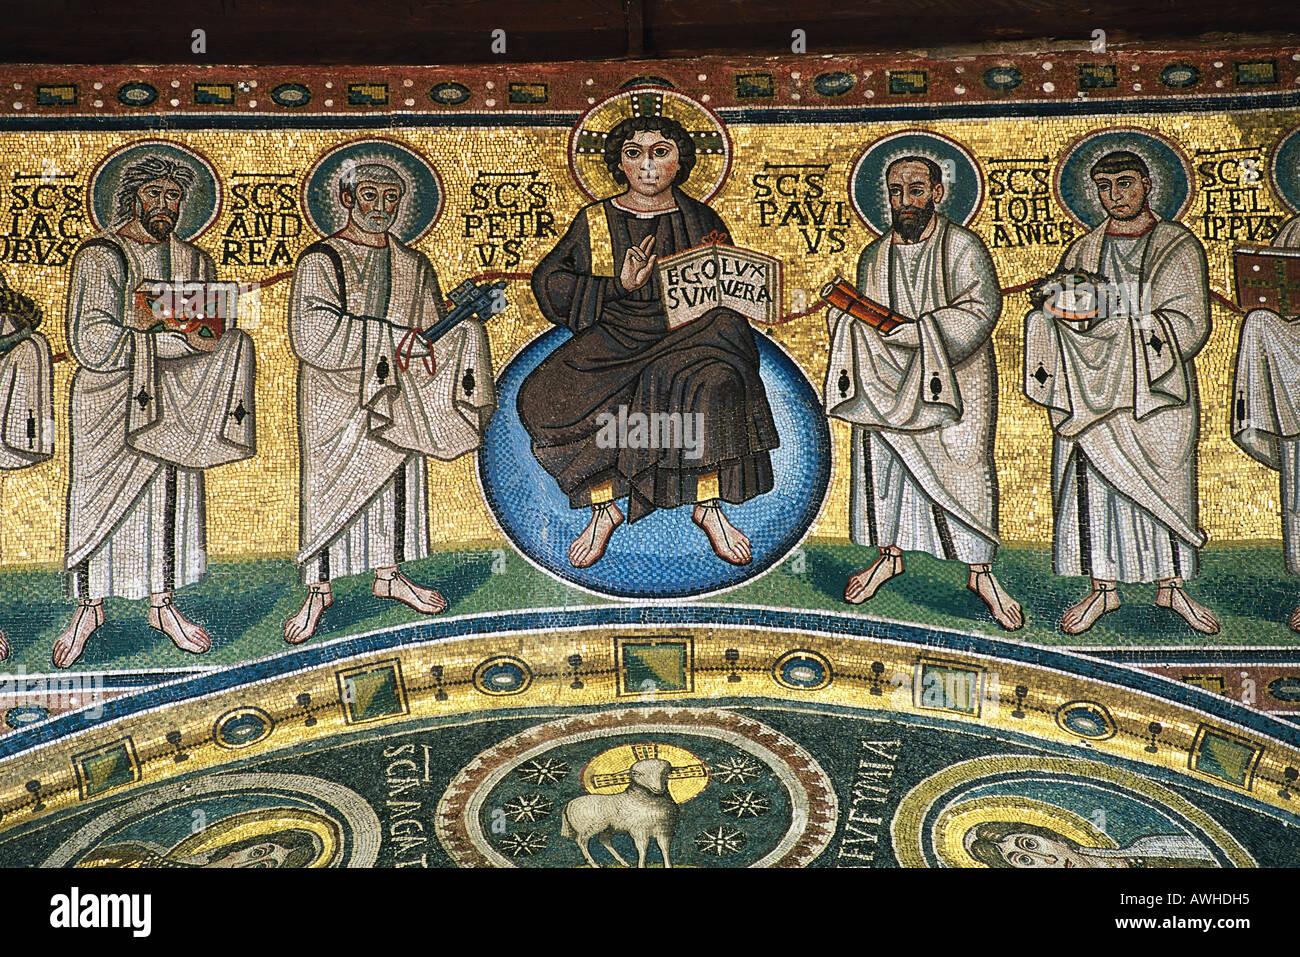 Croatia, Istria, Porec, Basilica of Euphrasius, Byzantine apse mosaic on triumphal arch depicting Christ and the Apostles - Stock Image